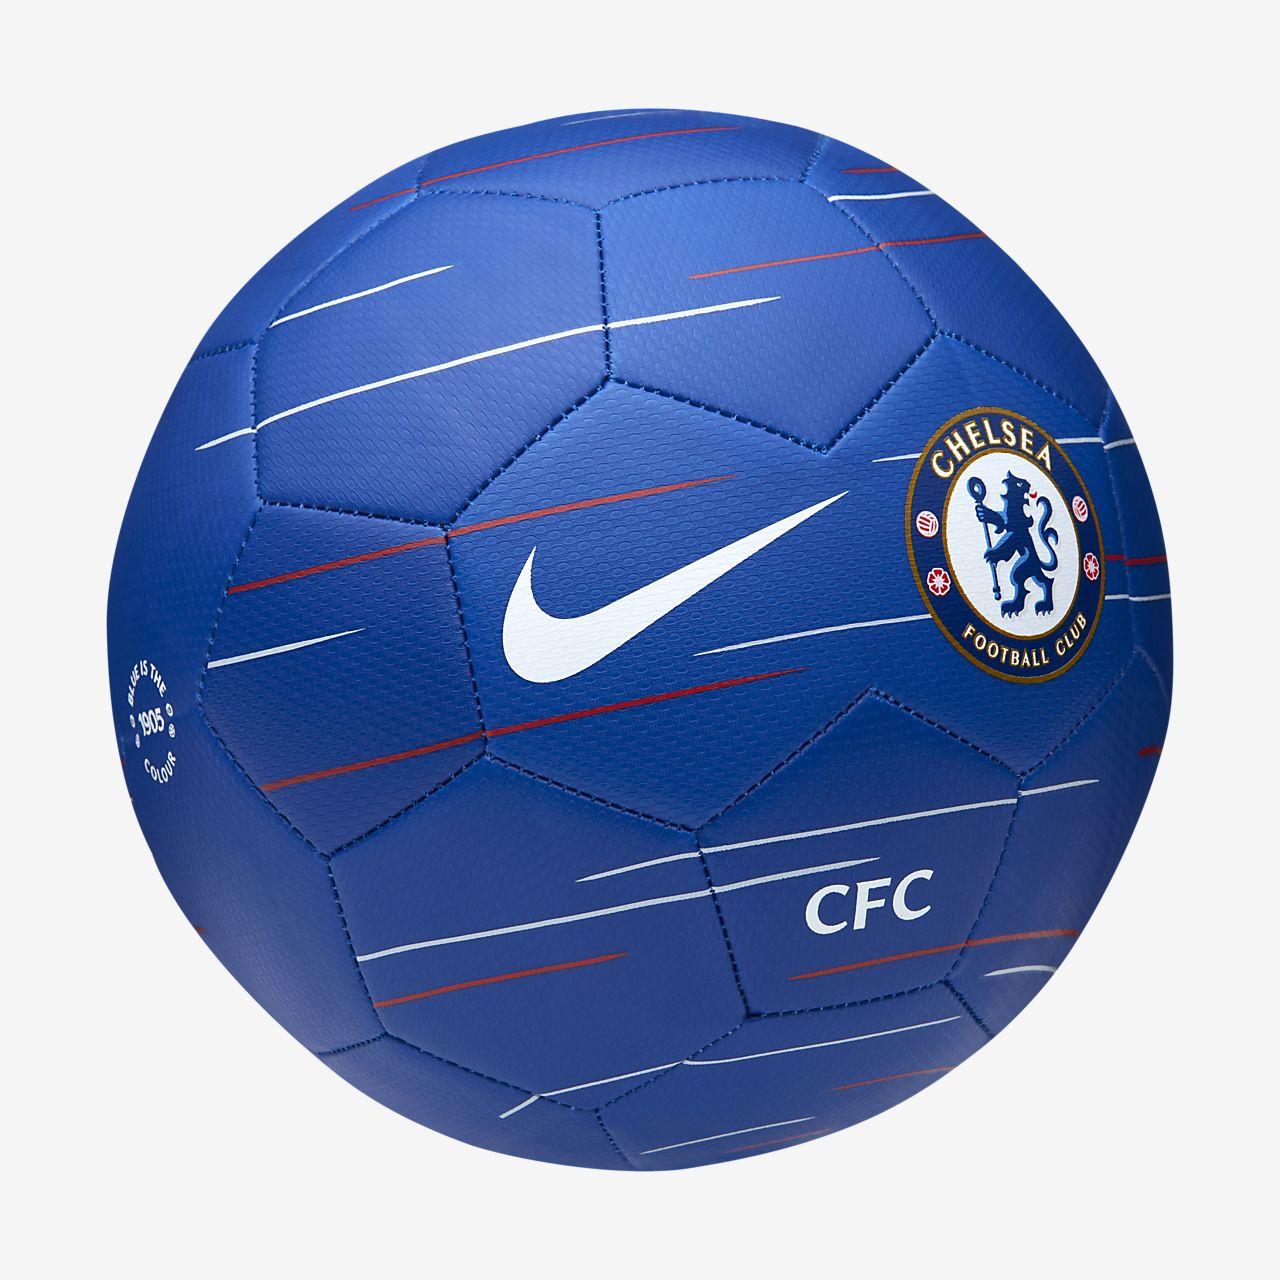 Bola de futebol Chelsea FC Prestige. Nike.com PT fe13457dcf814